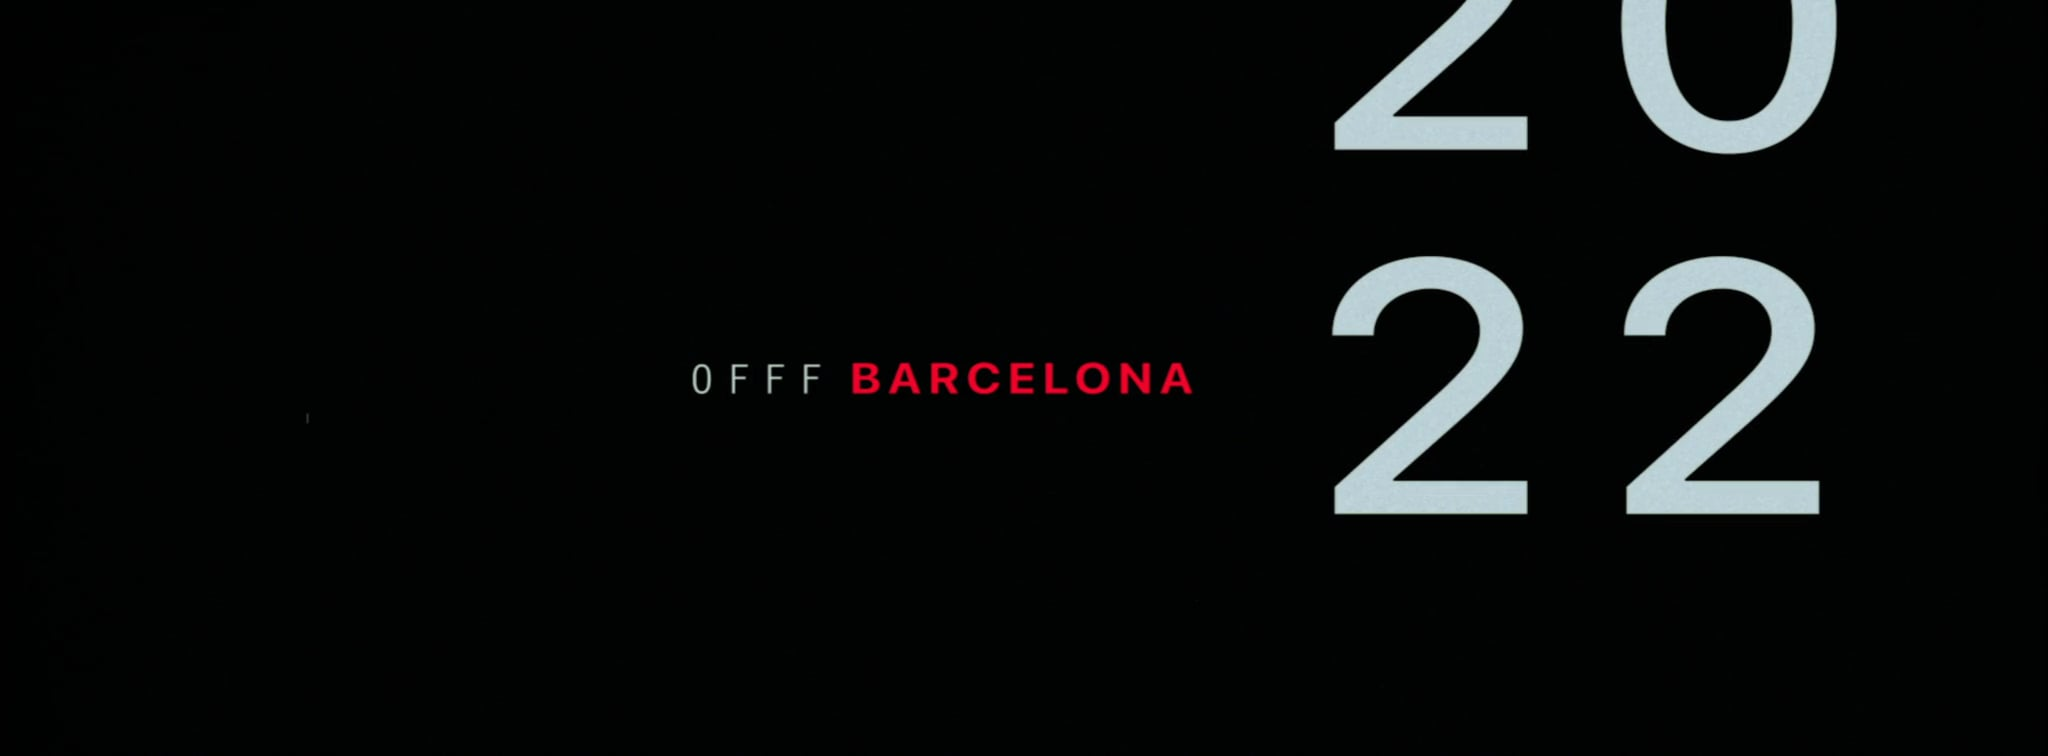 Gmunk and Ben Lukas Boysen for OFFF Barcelona 2022